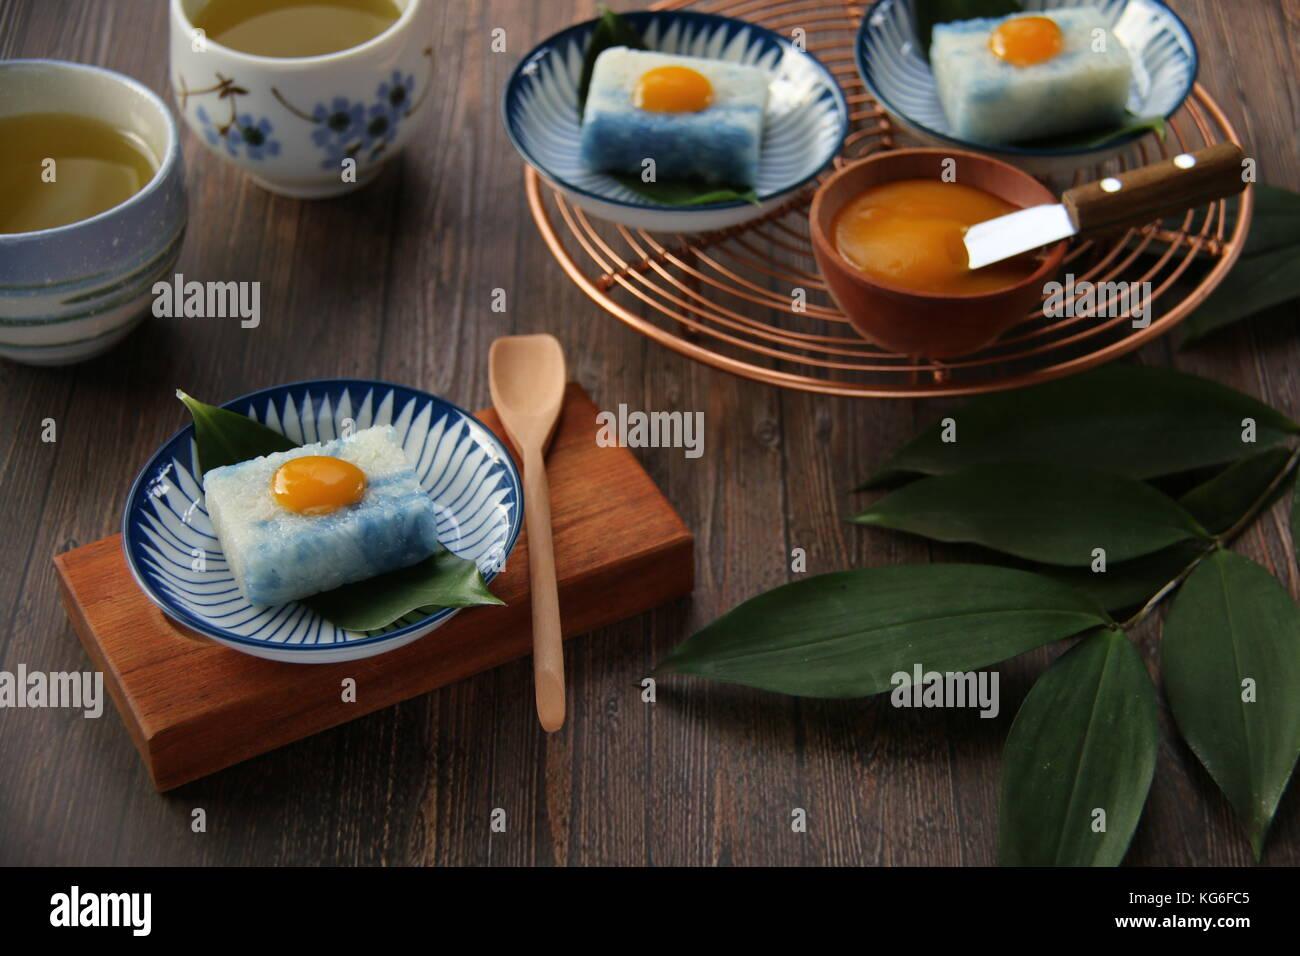 Tai tai ou pulut pulut tekan, le bleu et blanc peranakan, gâteau de riz gluant avec kaya jam Photo Stock